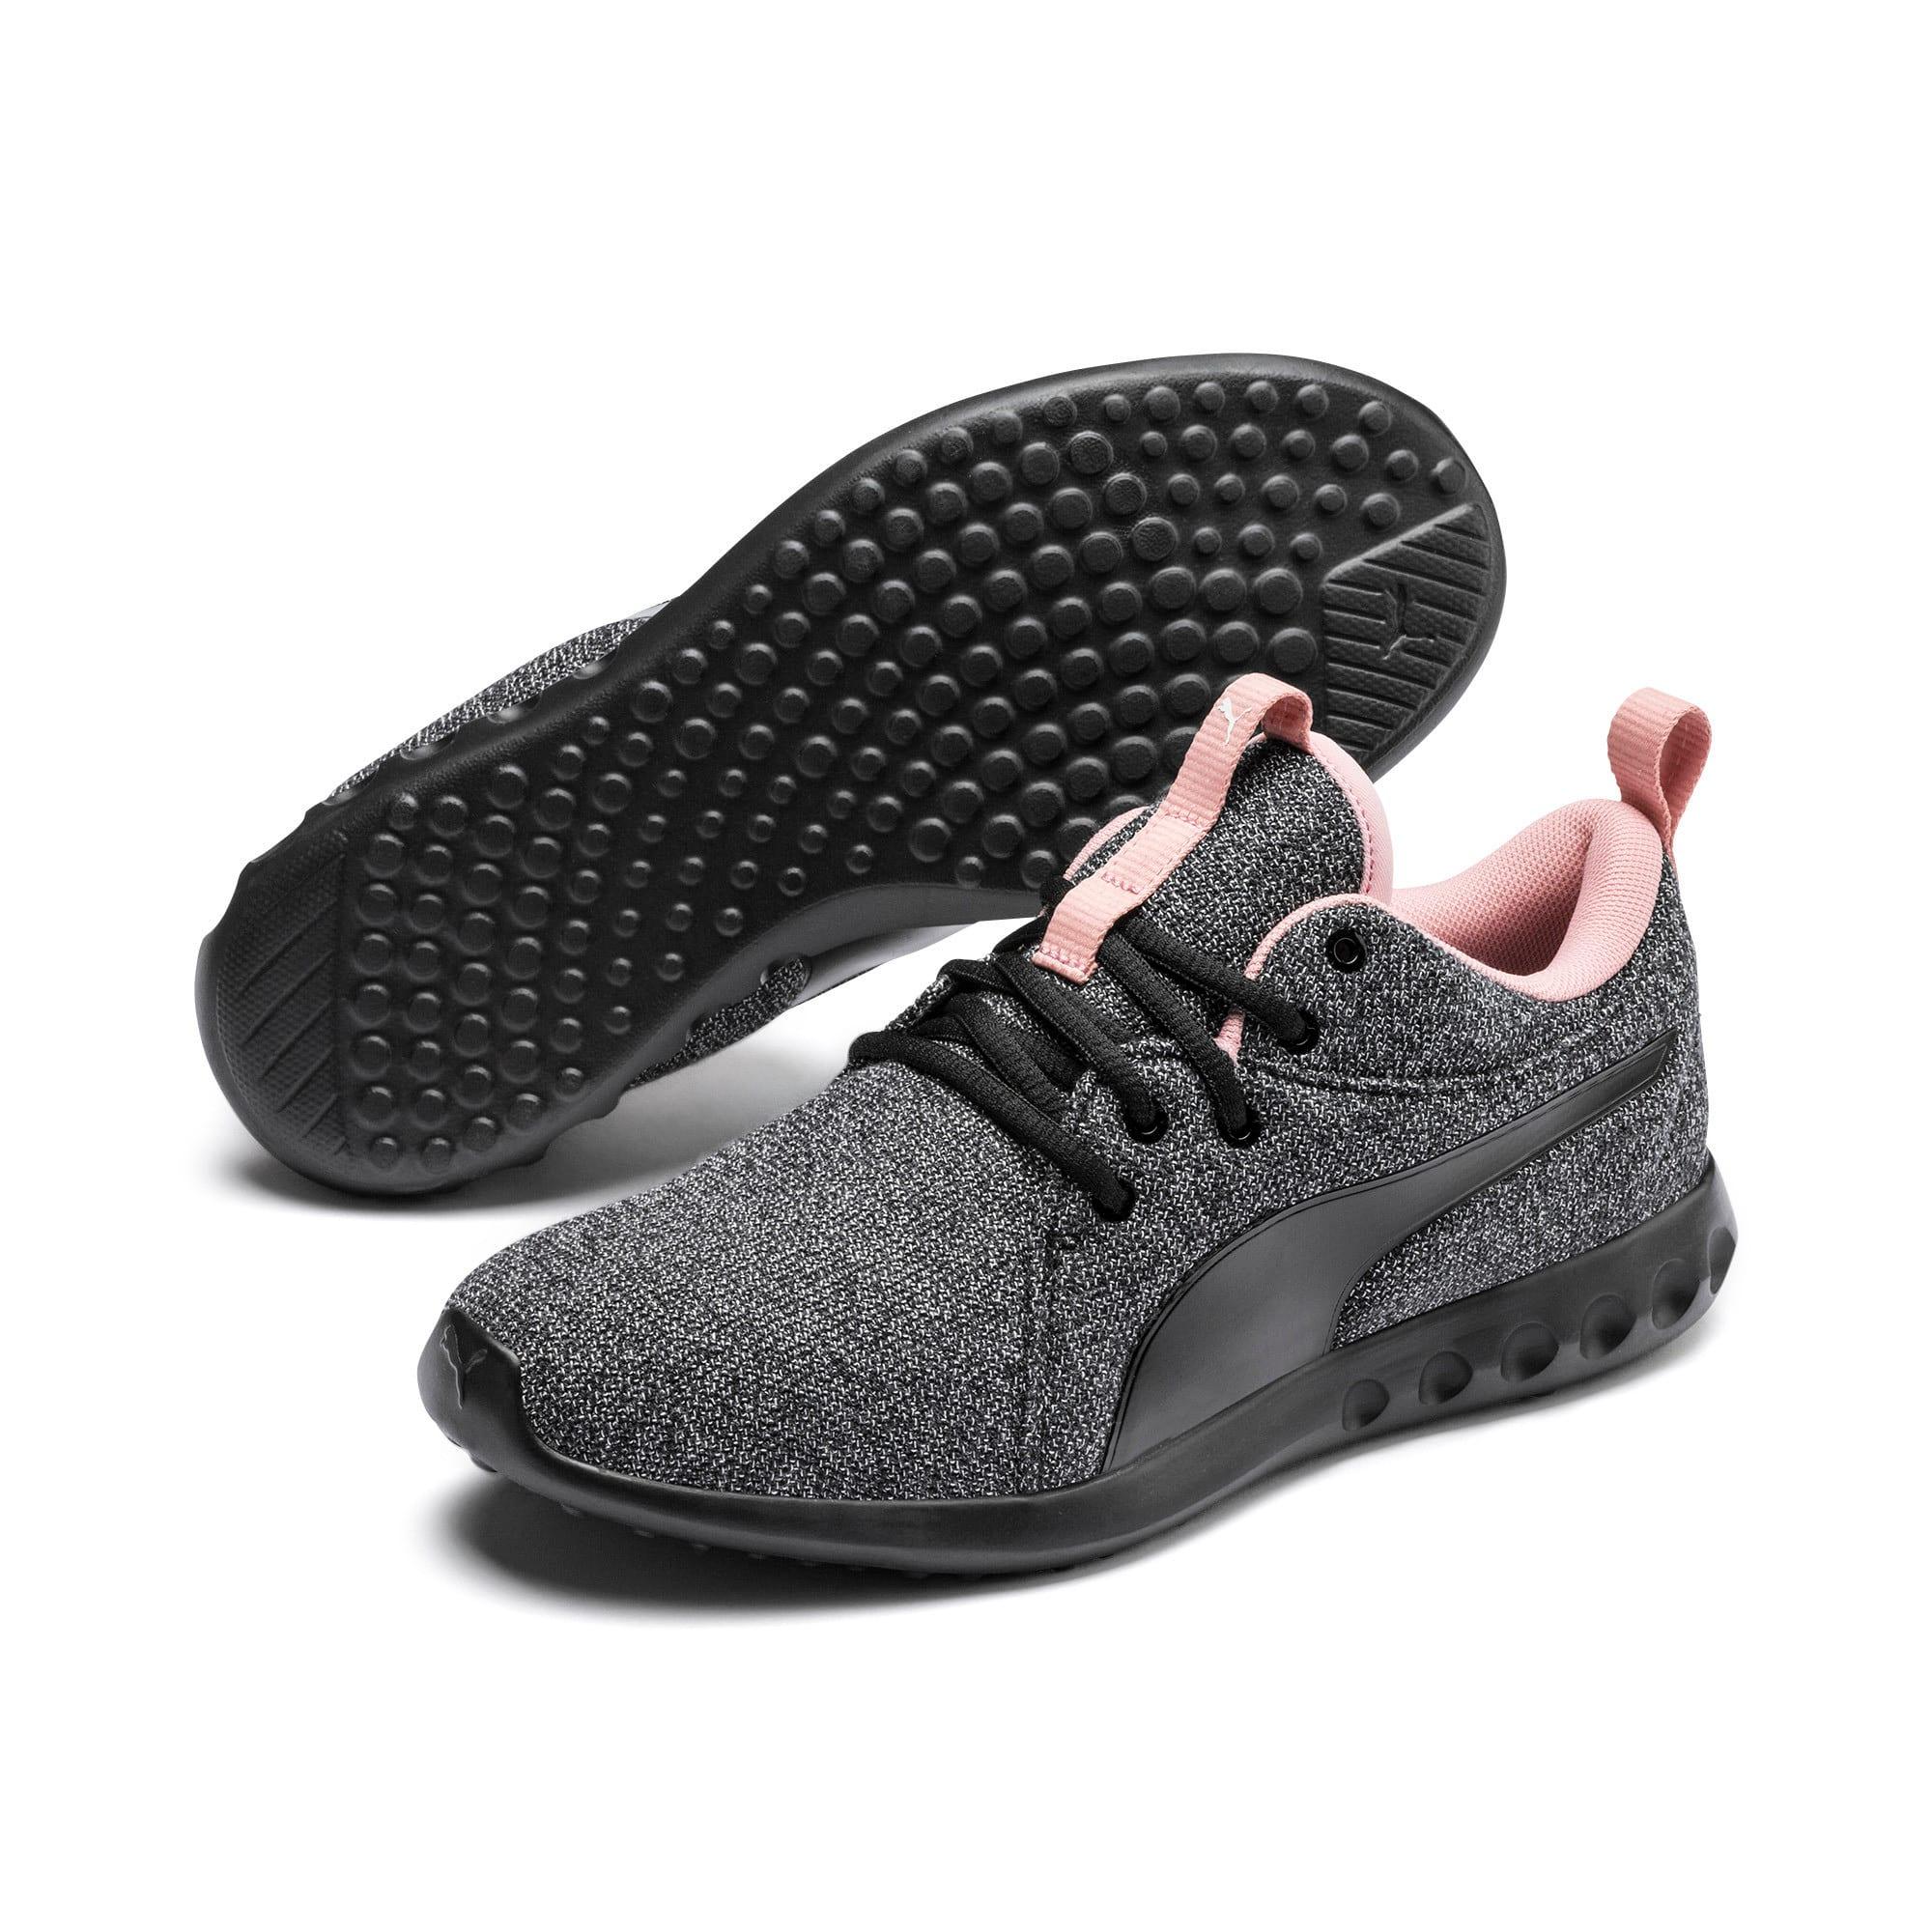 Thumbnail 2 of Carson 2 Knit Women's Running Shoes, Puma Black-White-Bridal Rose, medium